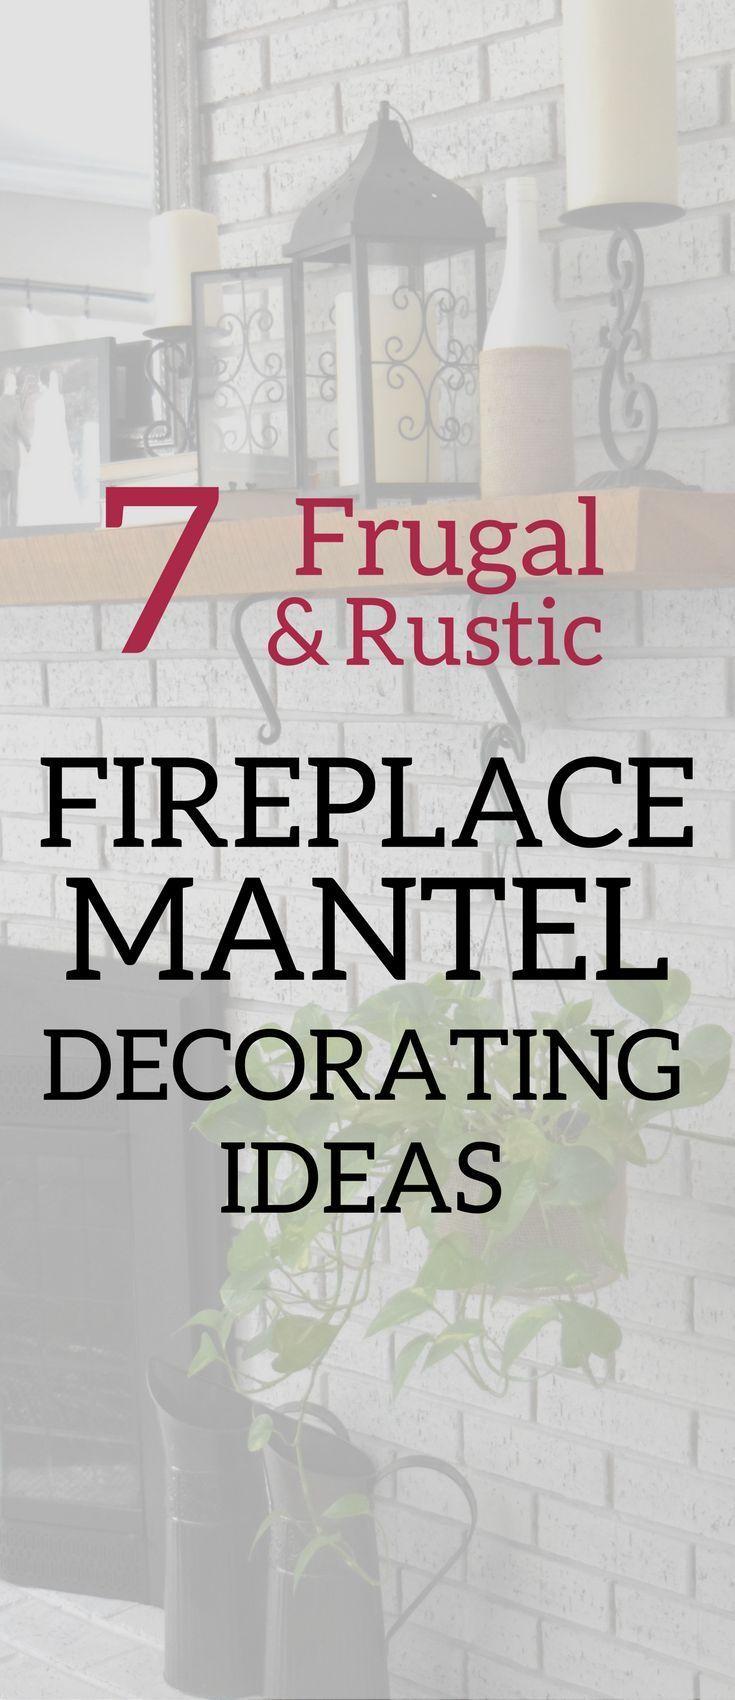 A Brick Home: Fireplace mantel decorating ideas, everyday mantel decorating ideas, mantel decor on a budget